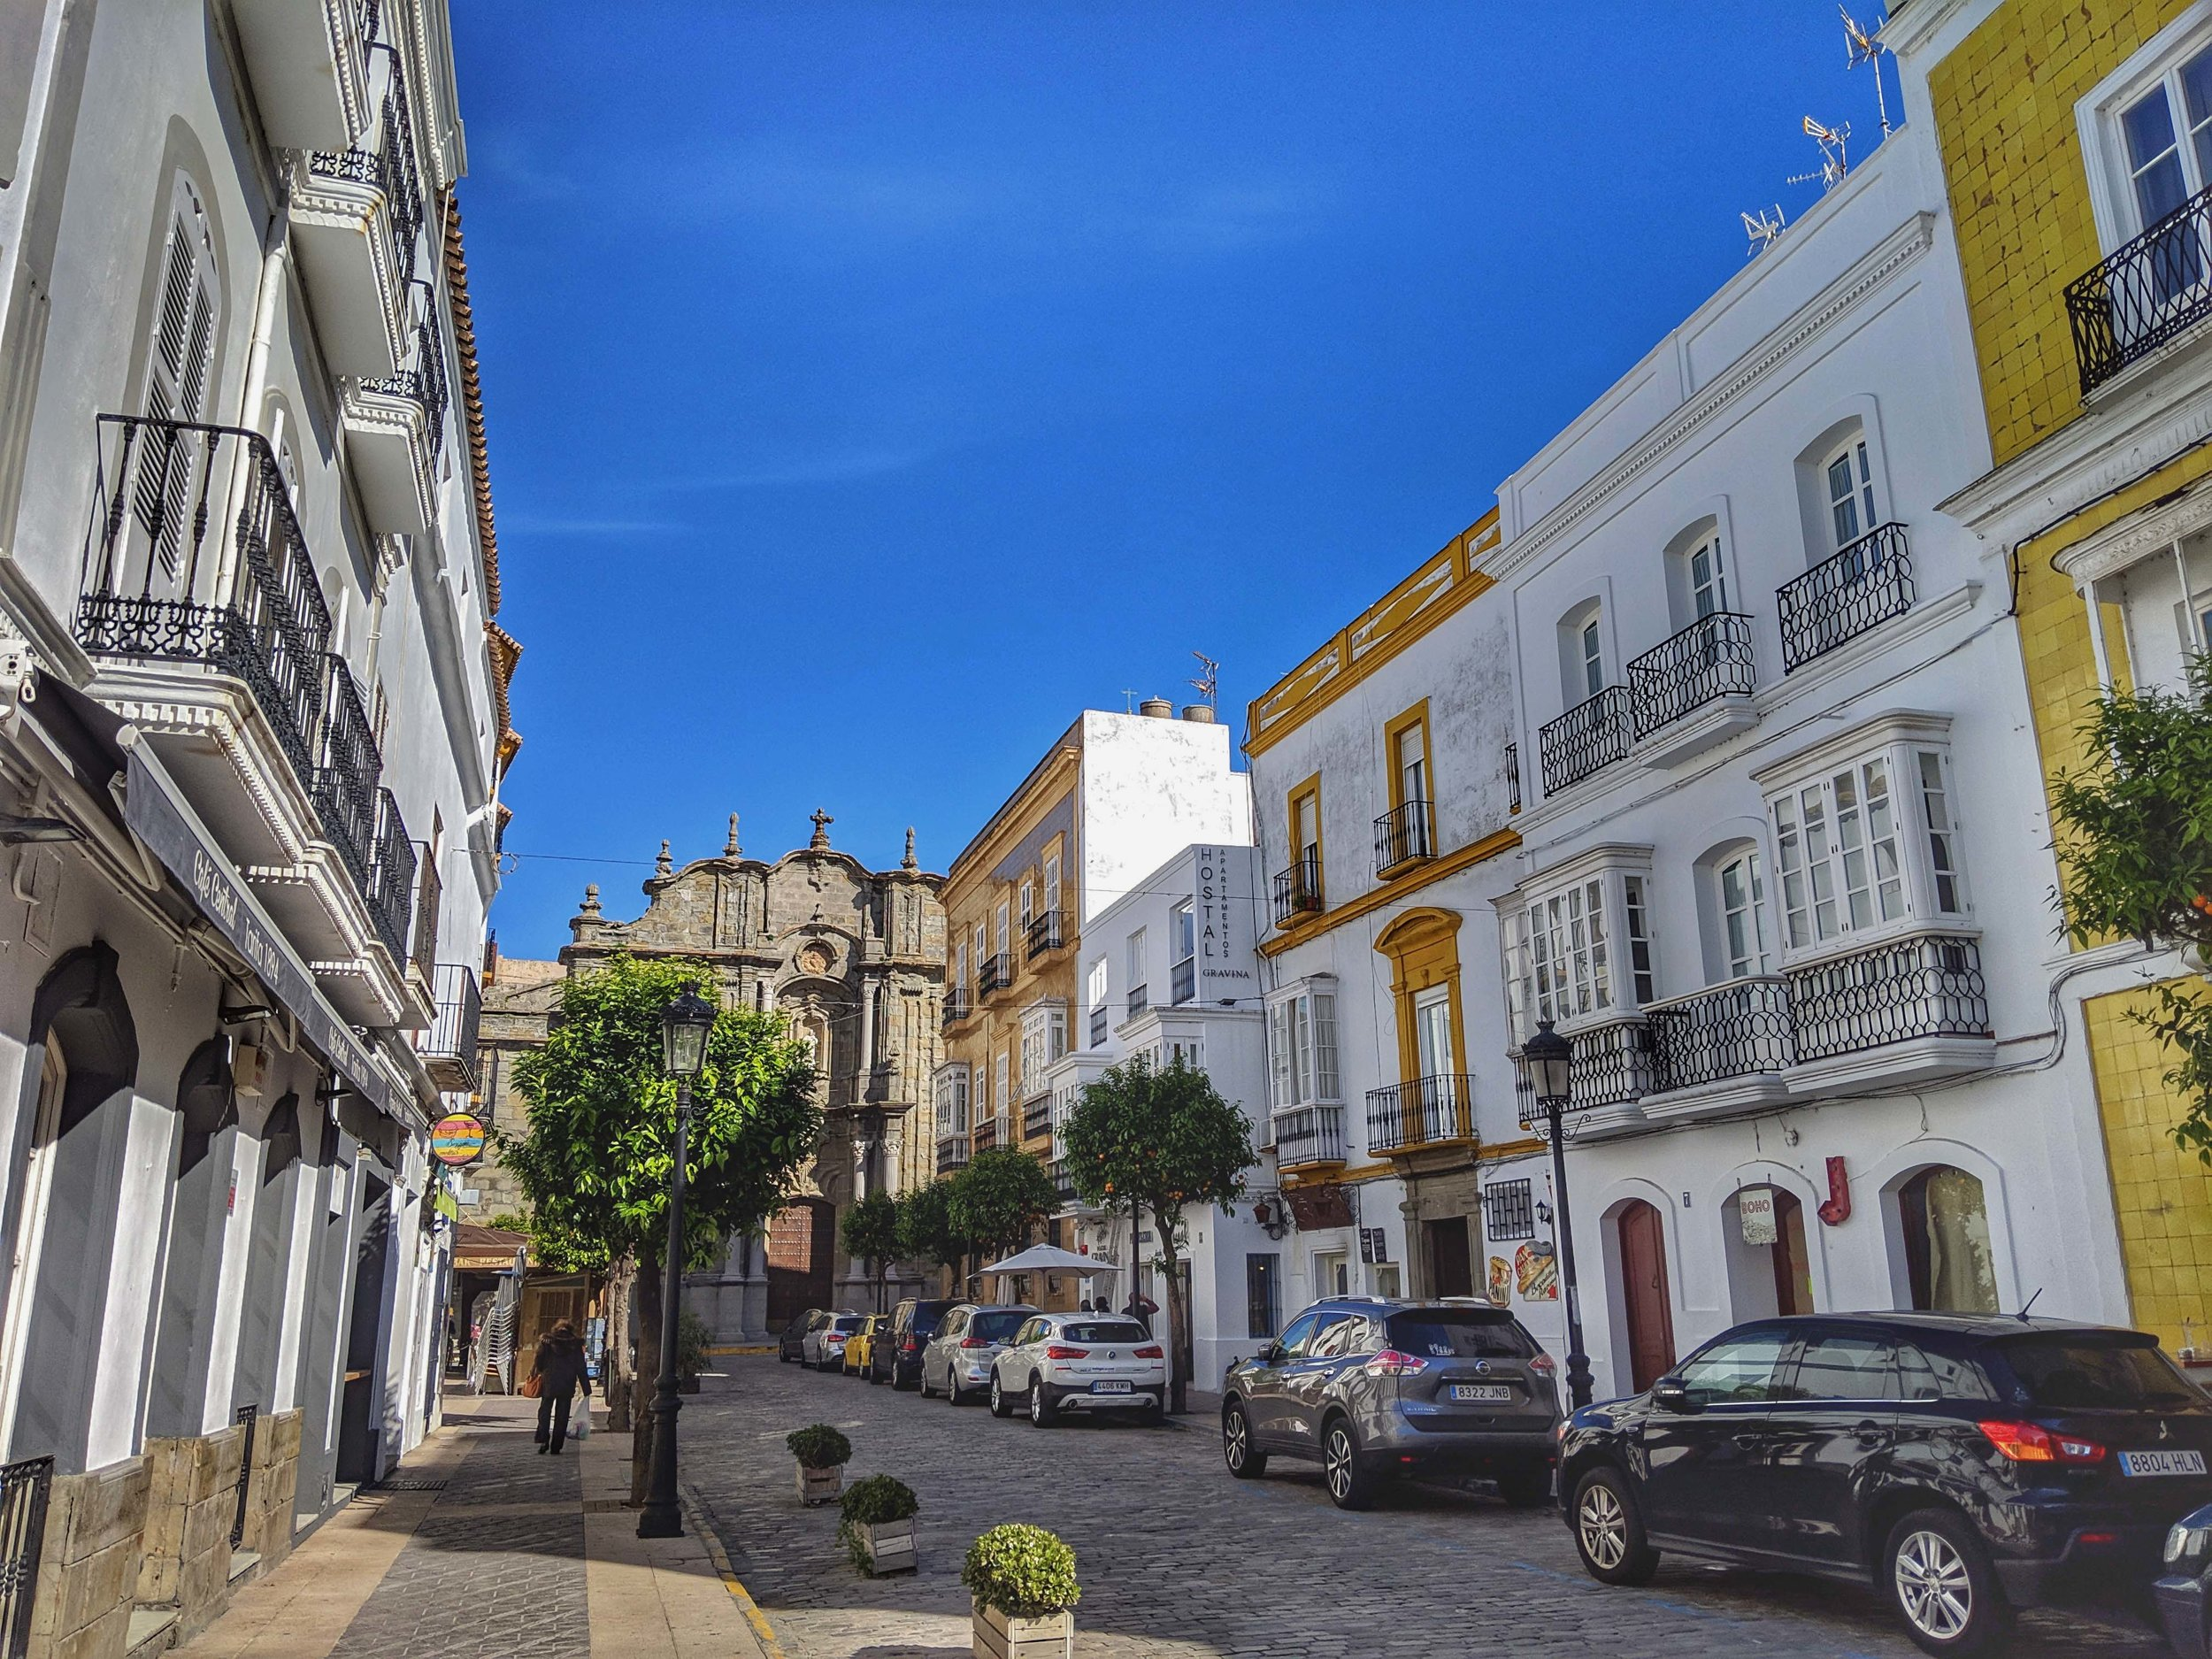 Charming old town Tarifa